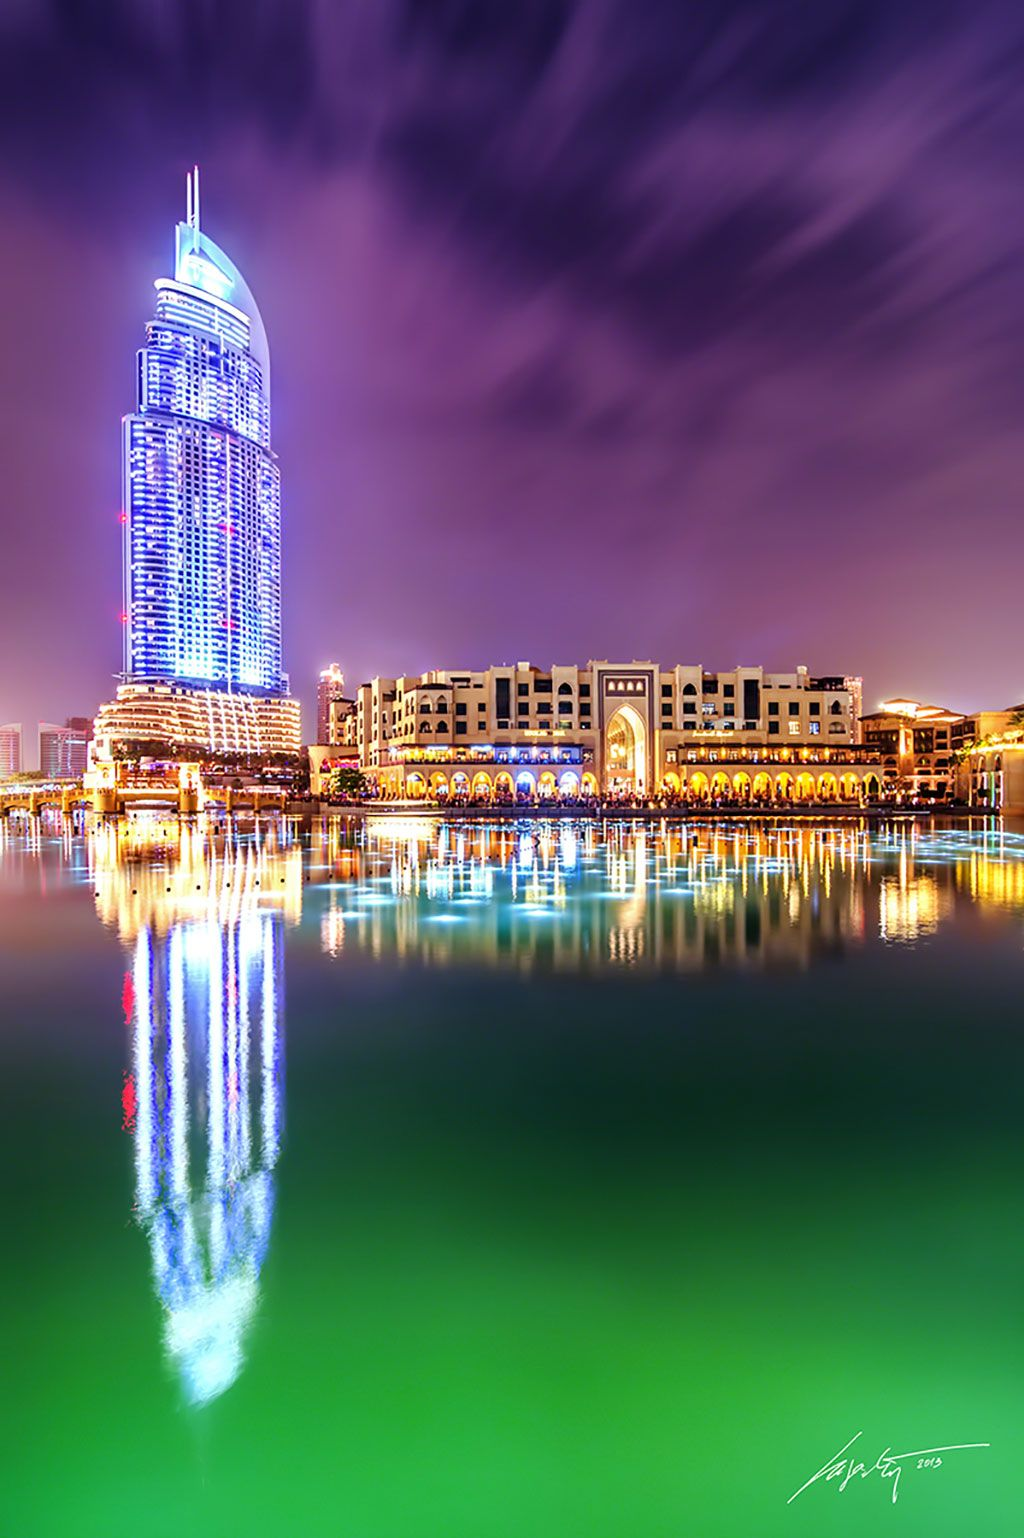 Dubai, The Jewel of the Arabian Gulf, 27 photos as never